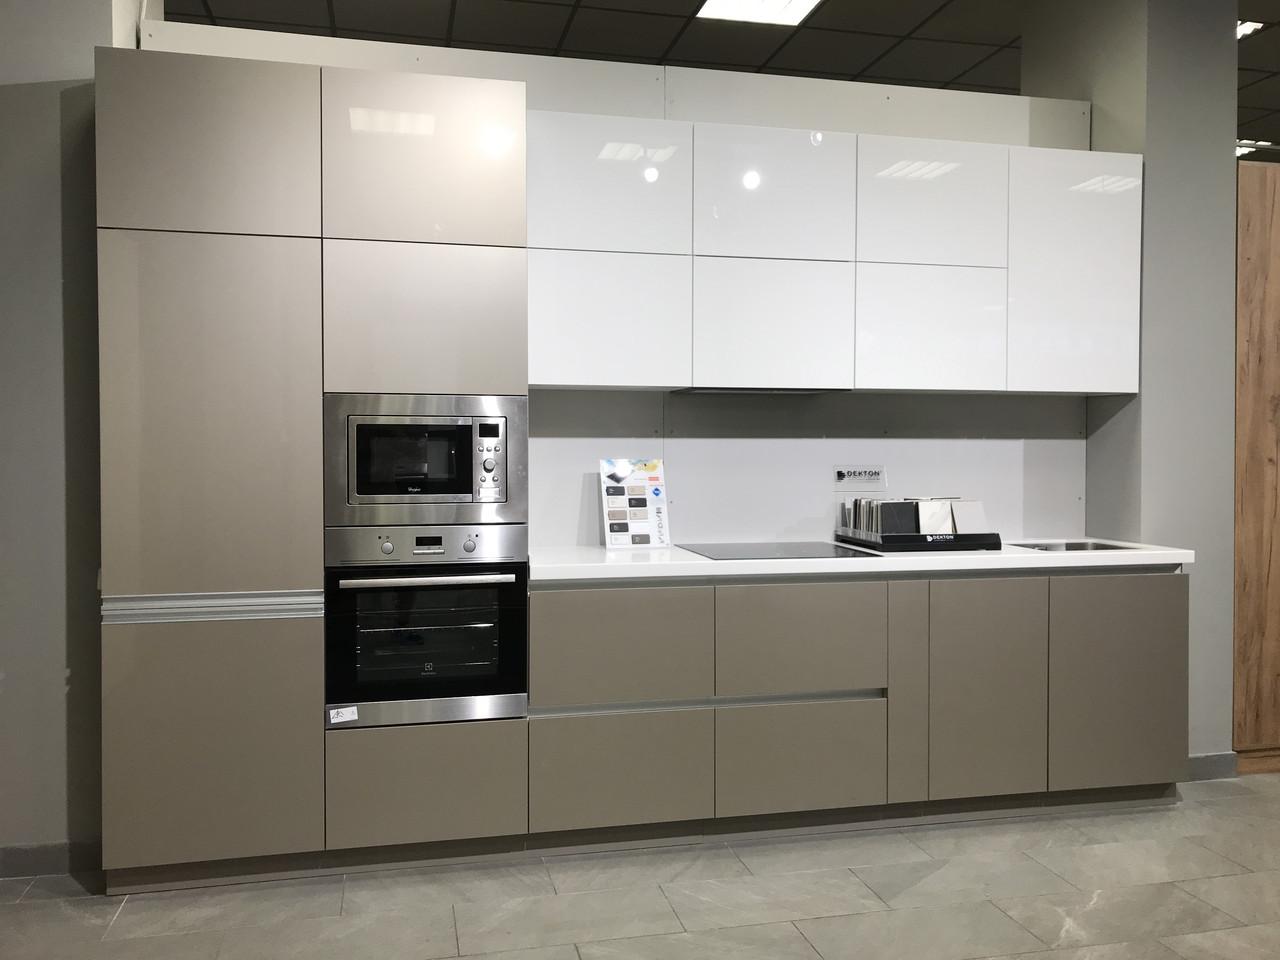 Кухня белая глянцевая нижние тумбы капучино металик. Новинка, фото 1